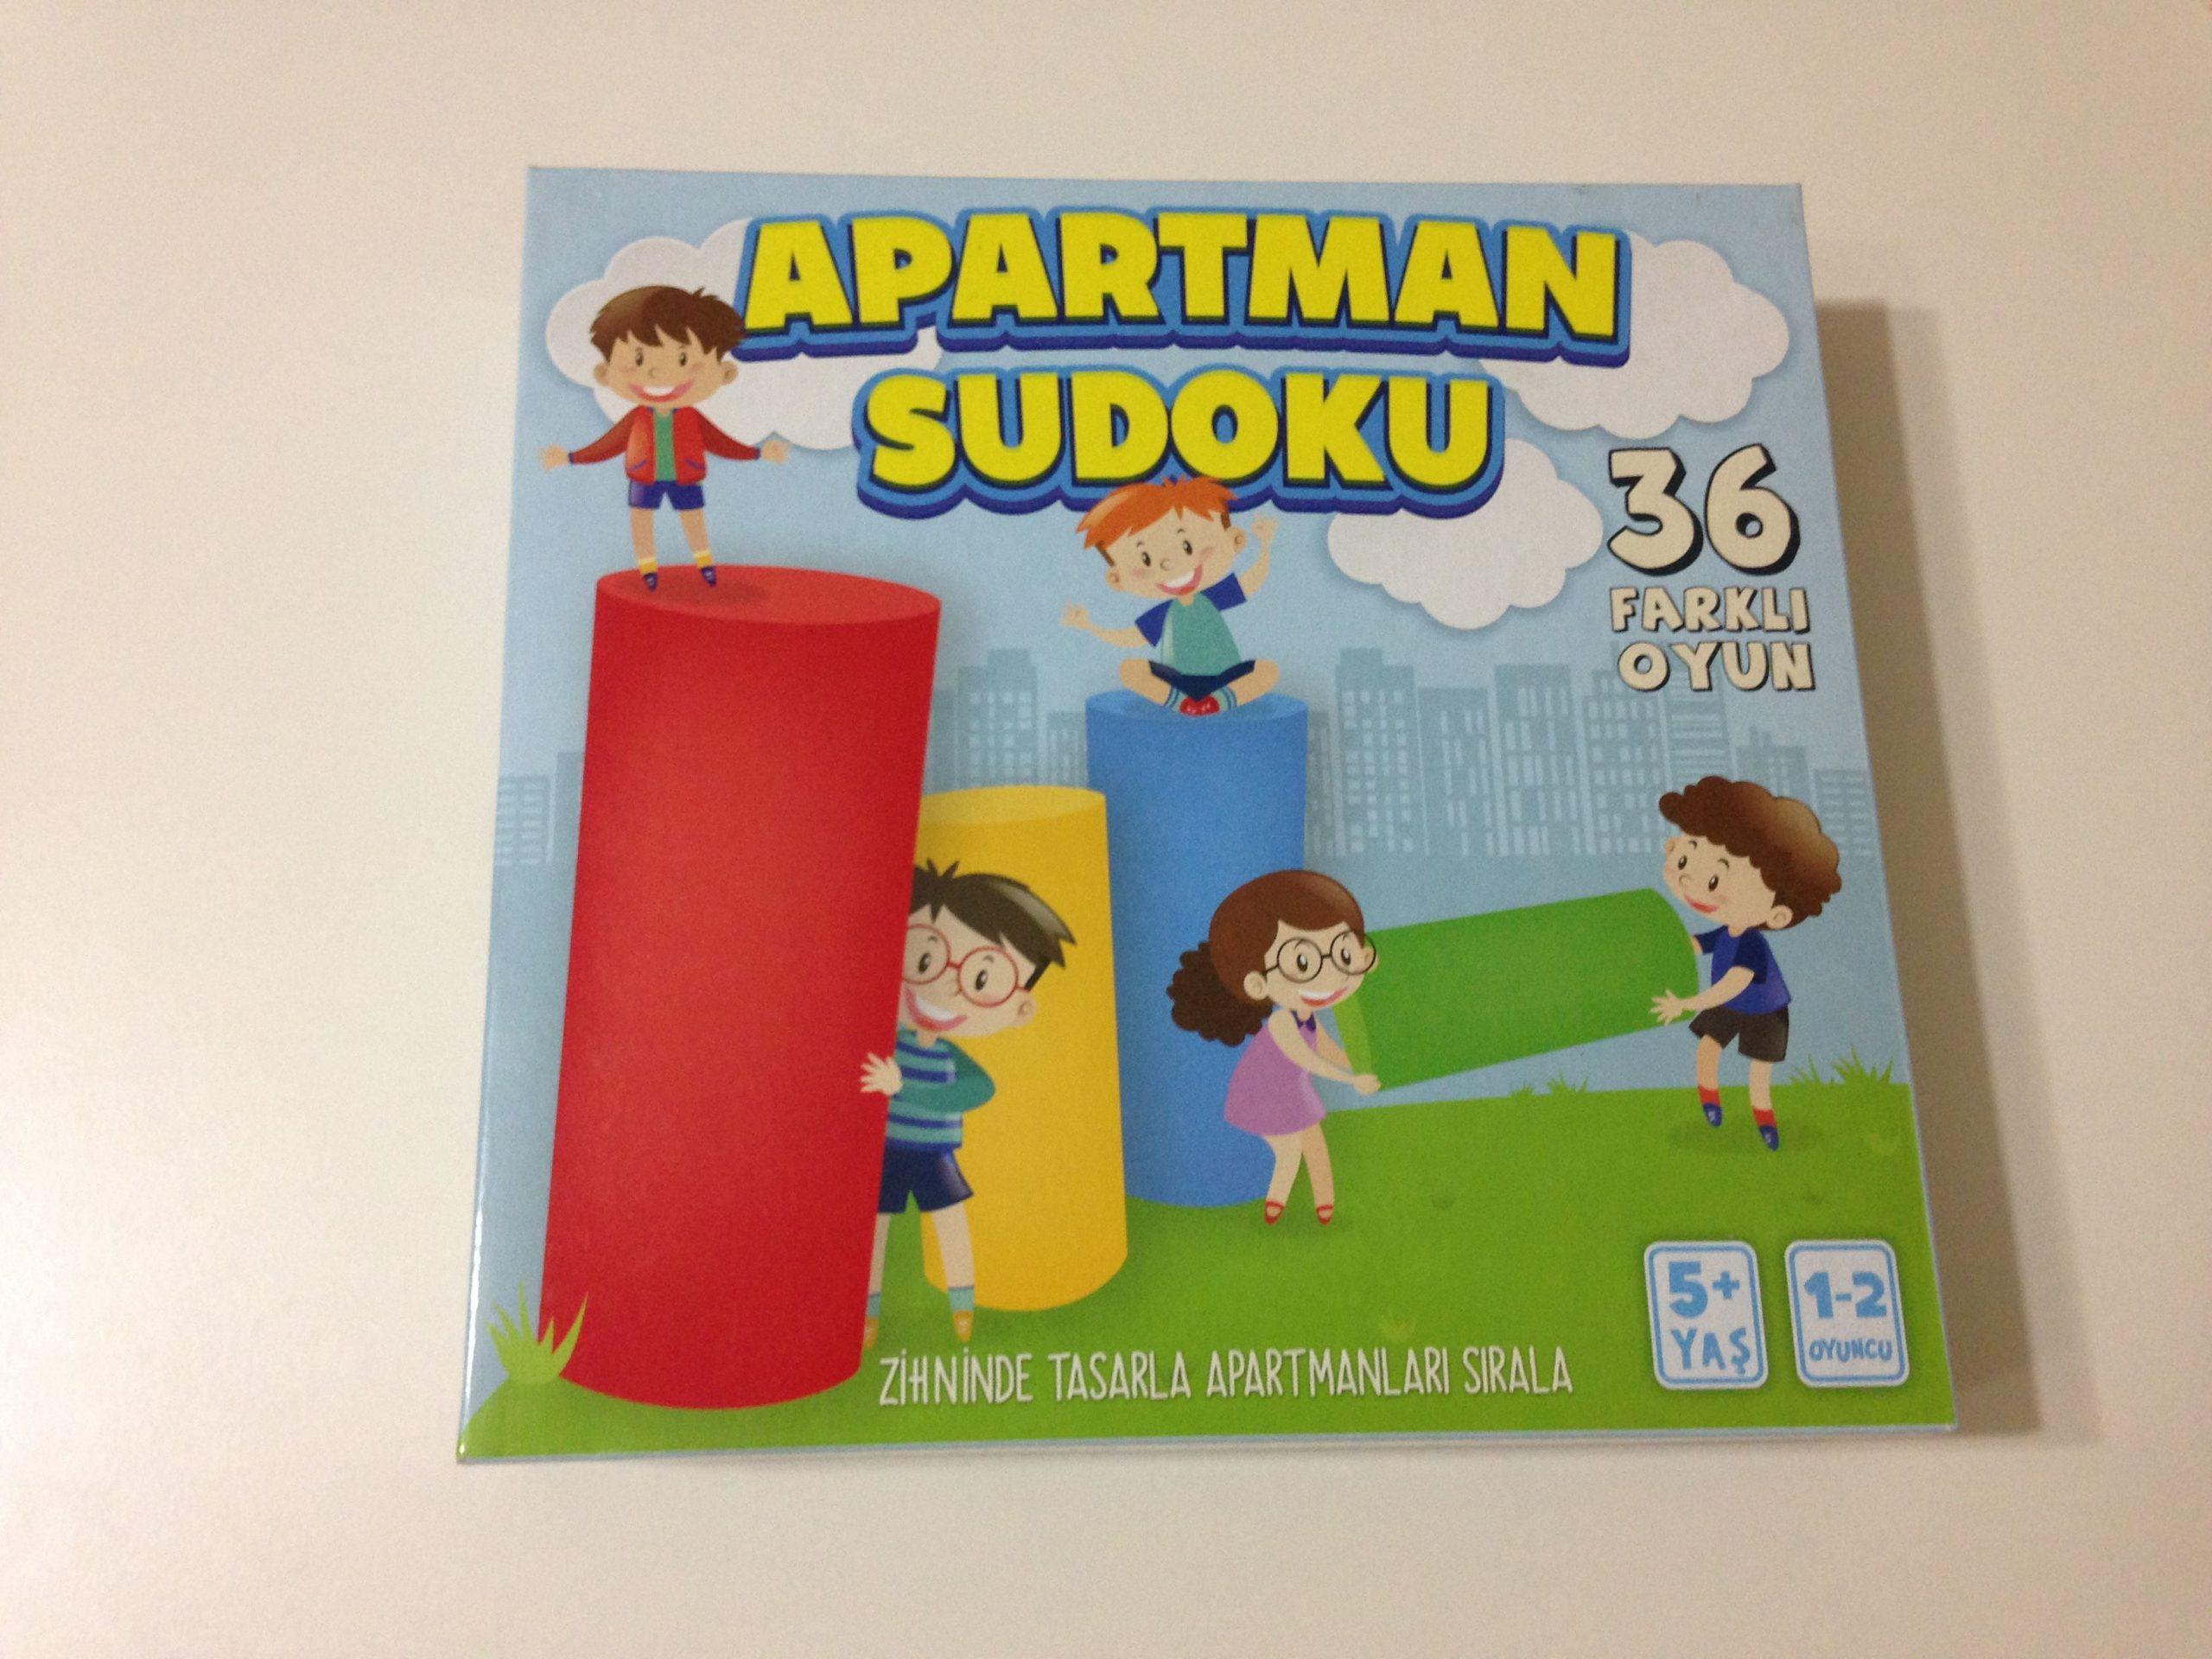 Apartman Sudoku Akıl Ve Zeka Oyunu.. Eğitici Oyun 35 Tl destiné Telecharger Sudoku